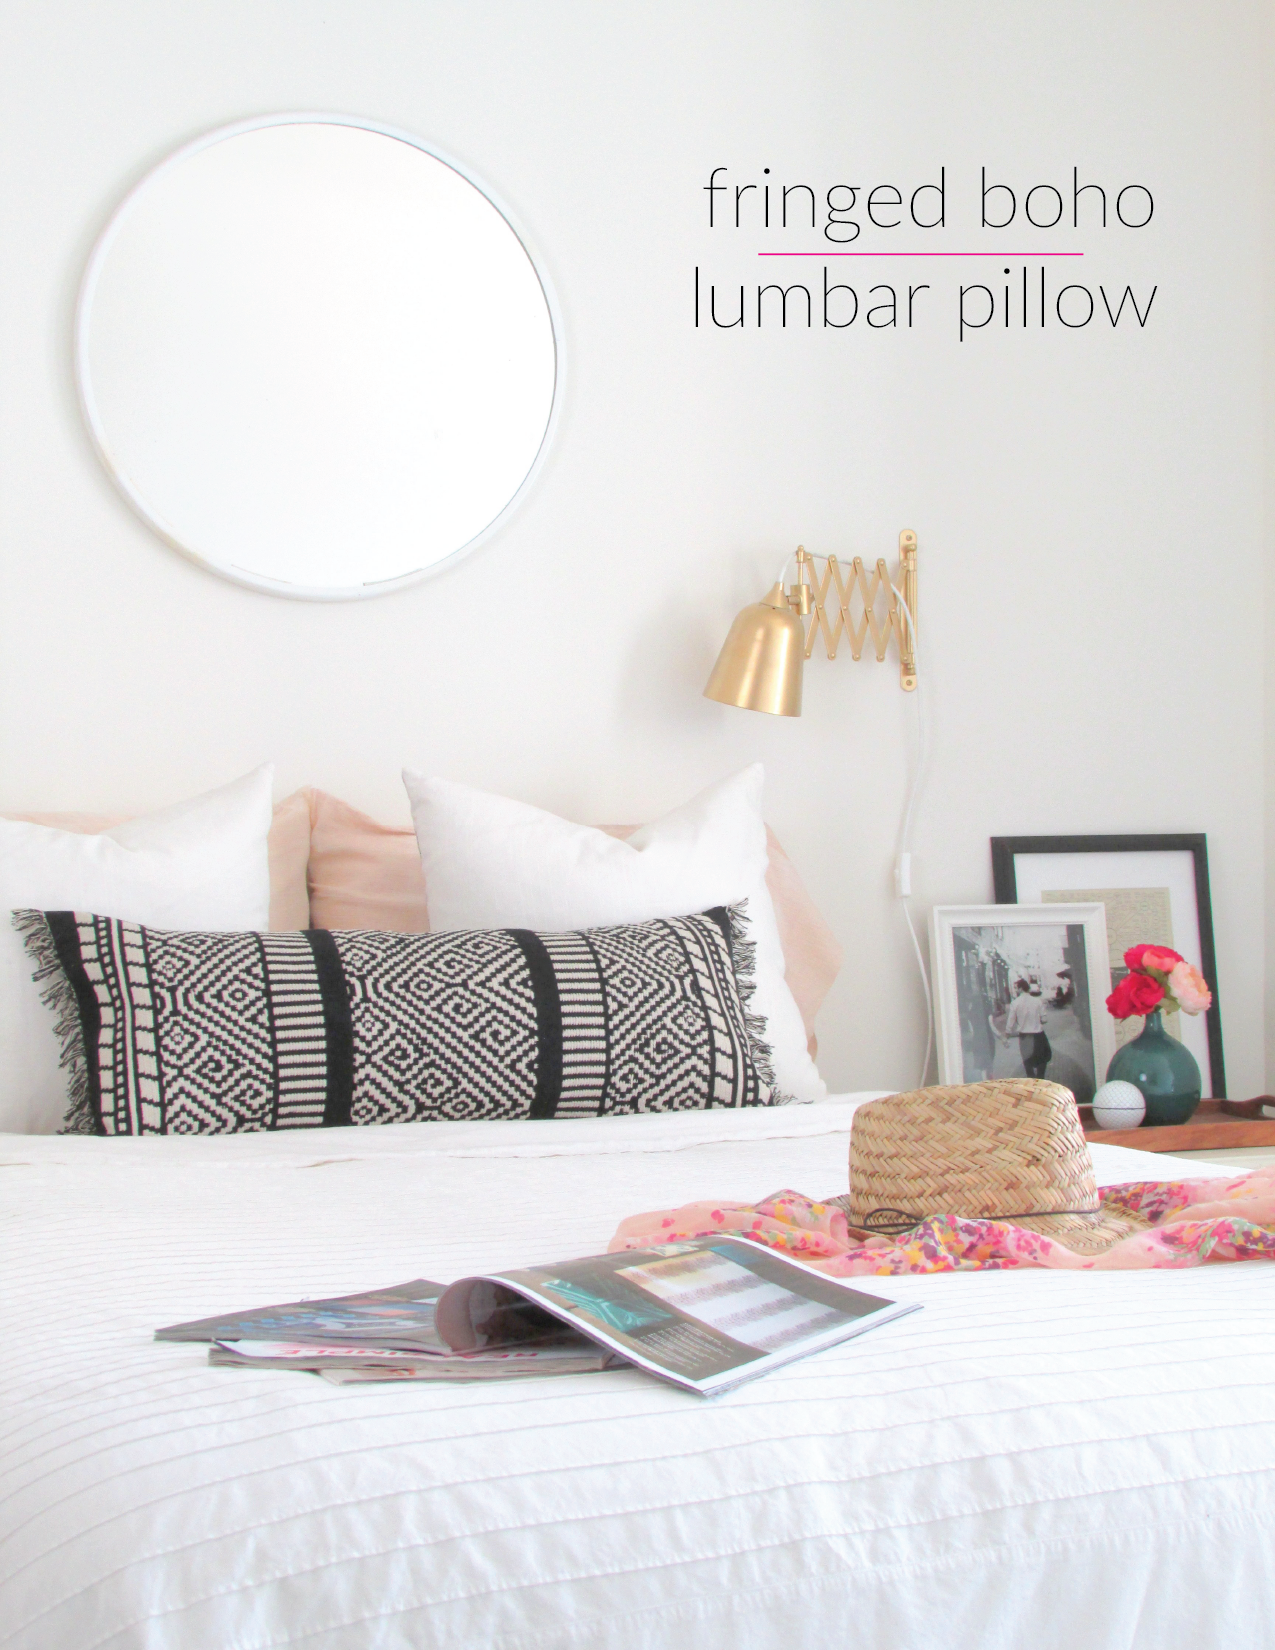 make a boho lumbar pillow from a table runner - francois et moi